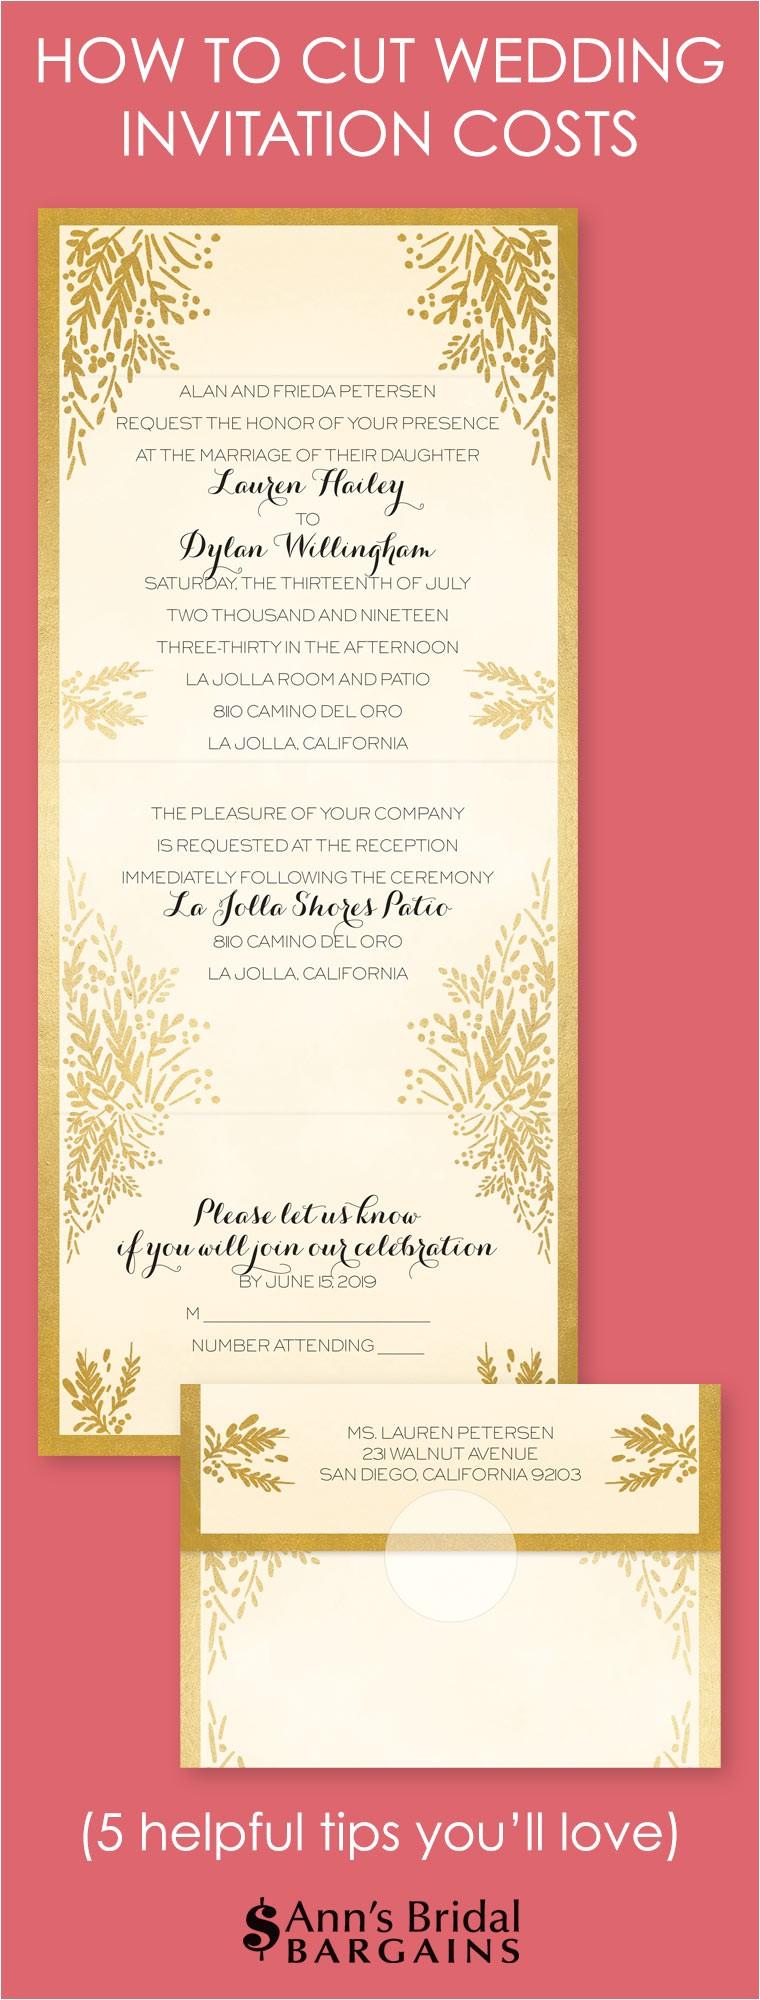 Wedding Invitation Costs How to Cut Wedding Invitation Costs Ann 39 S Bridal Bargains